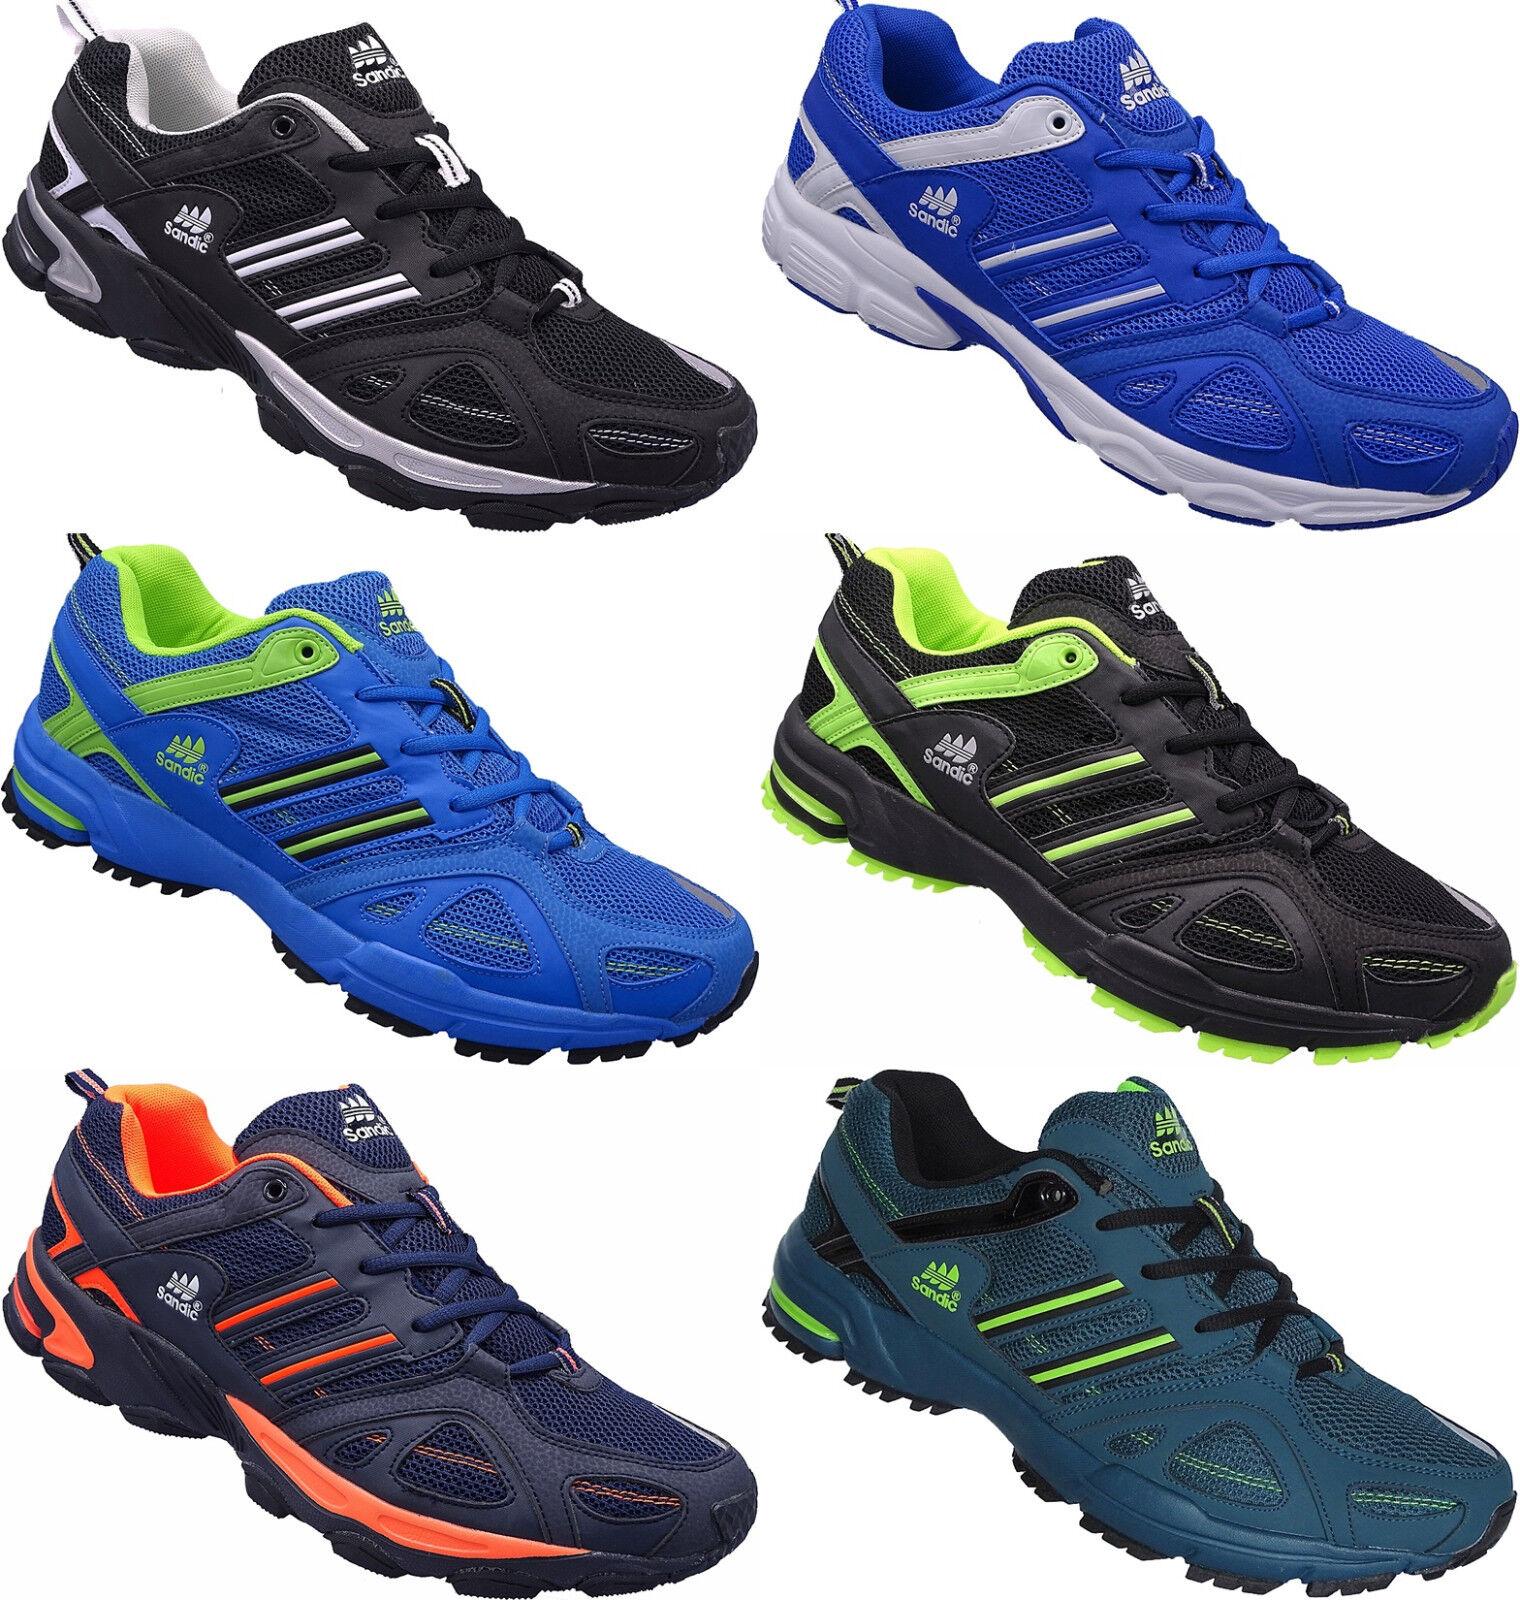 6db170f32a250 Herren Sportschuhe Sneaker Turnschuhe Schuhe Übergröße gr.47 - 49 Art.-Nr.  ...